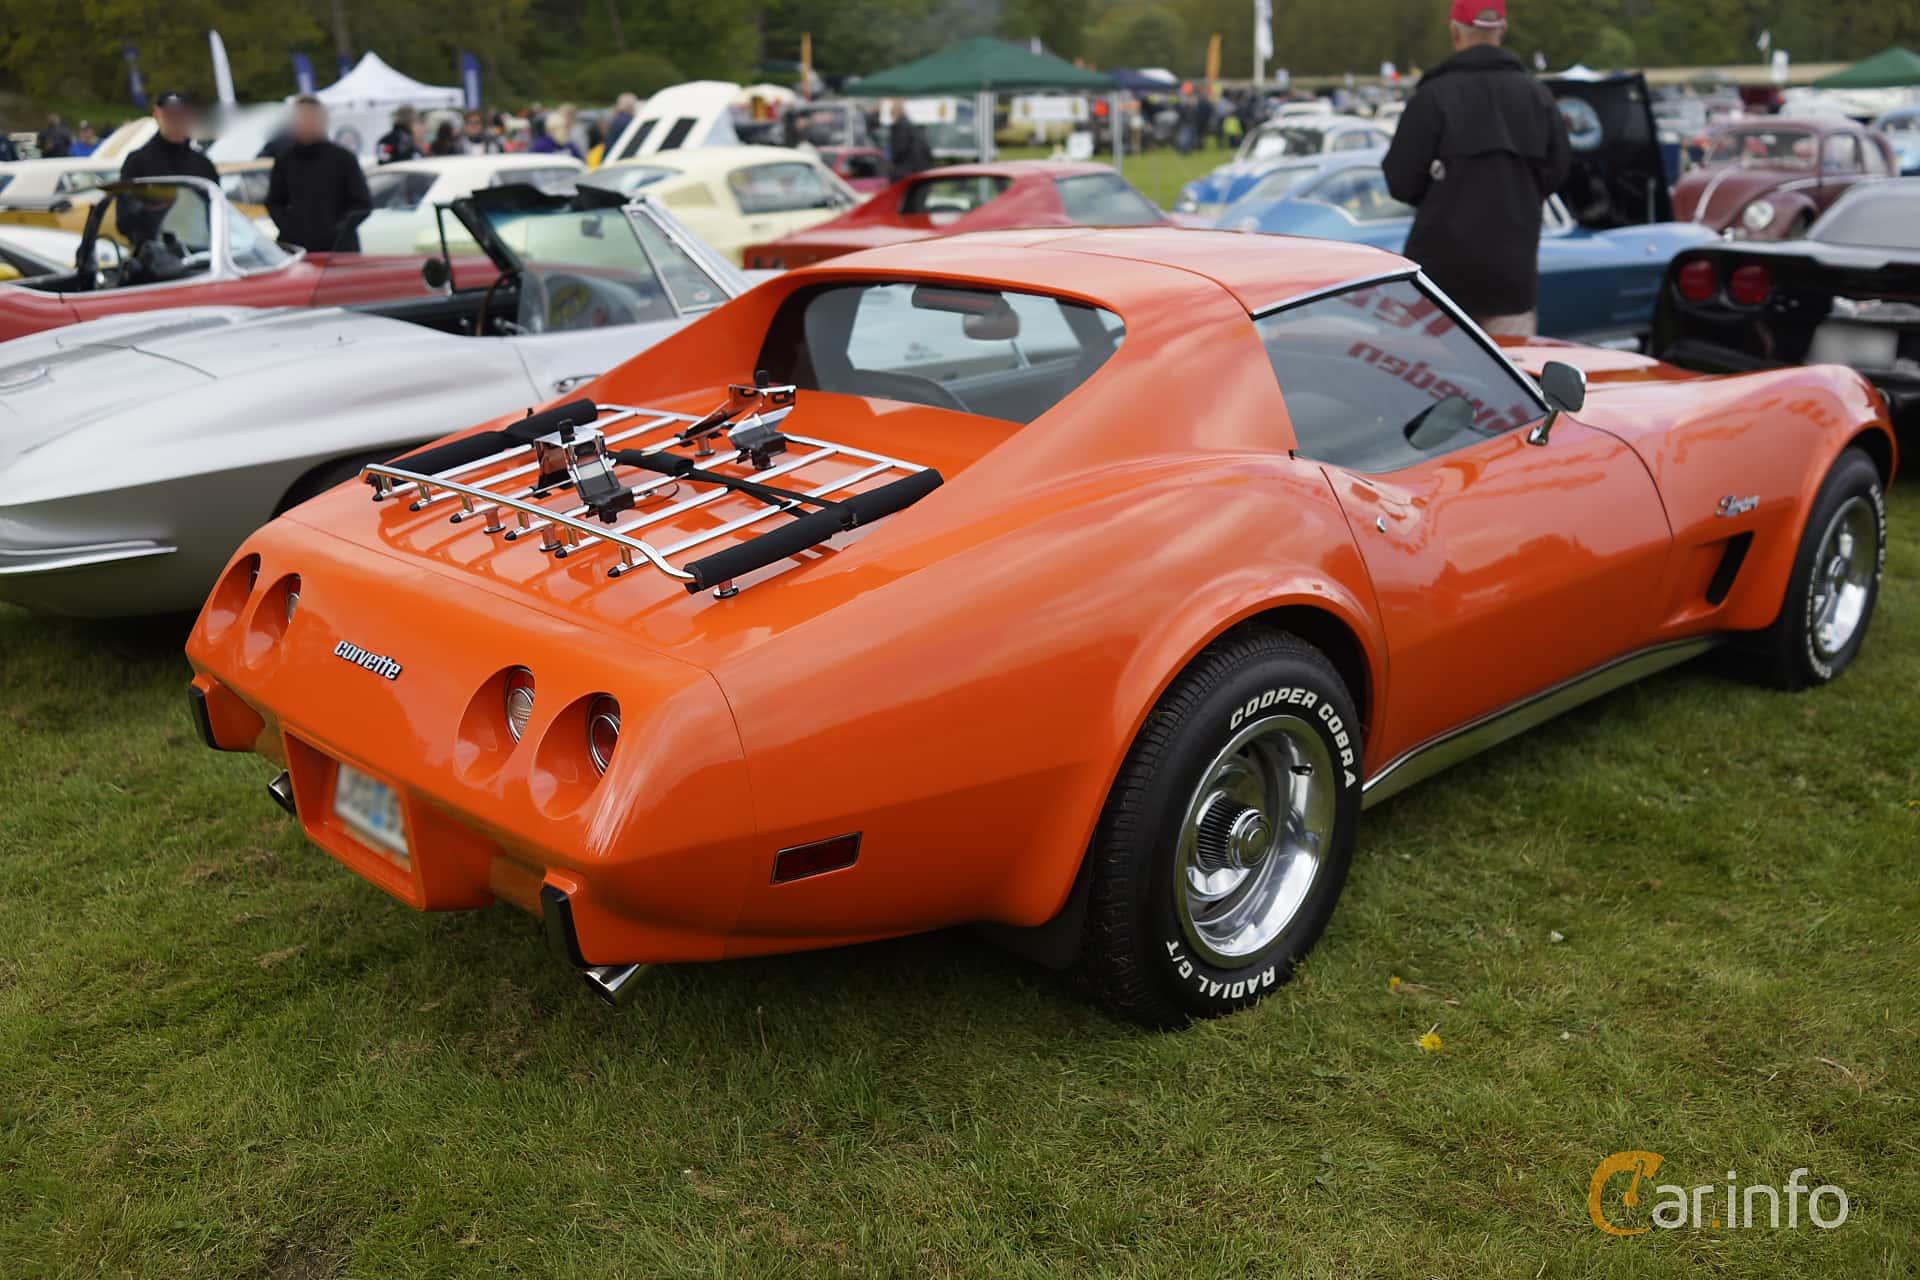 Chevrolet Corvette Stingray 5.7 V8 Automatic, 213hp, 1976 at Tjolöholm Classic Motor 2015